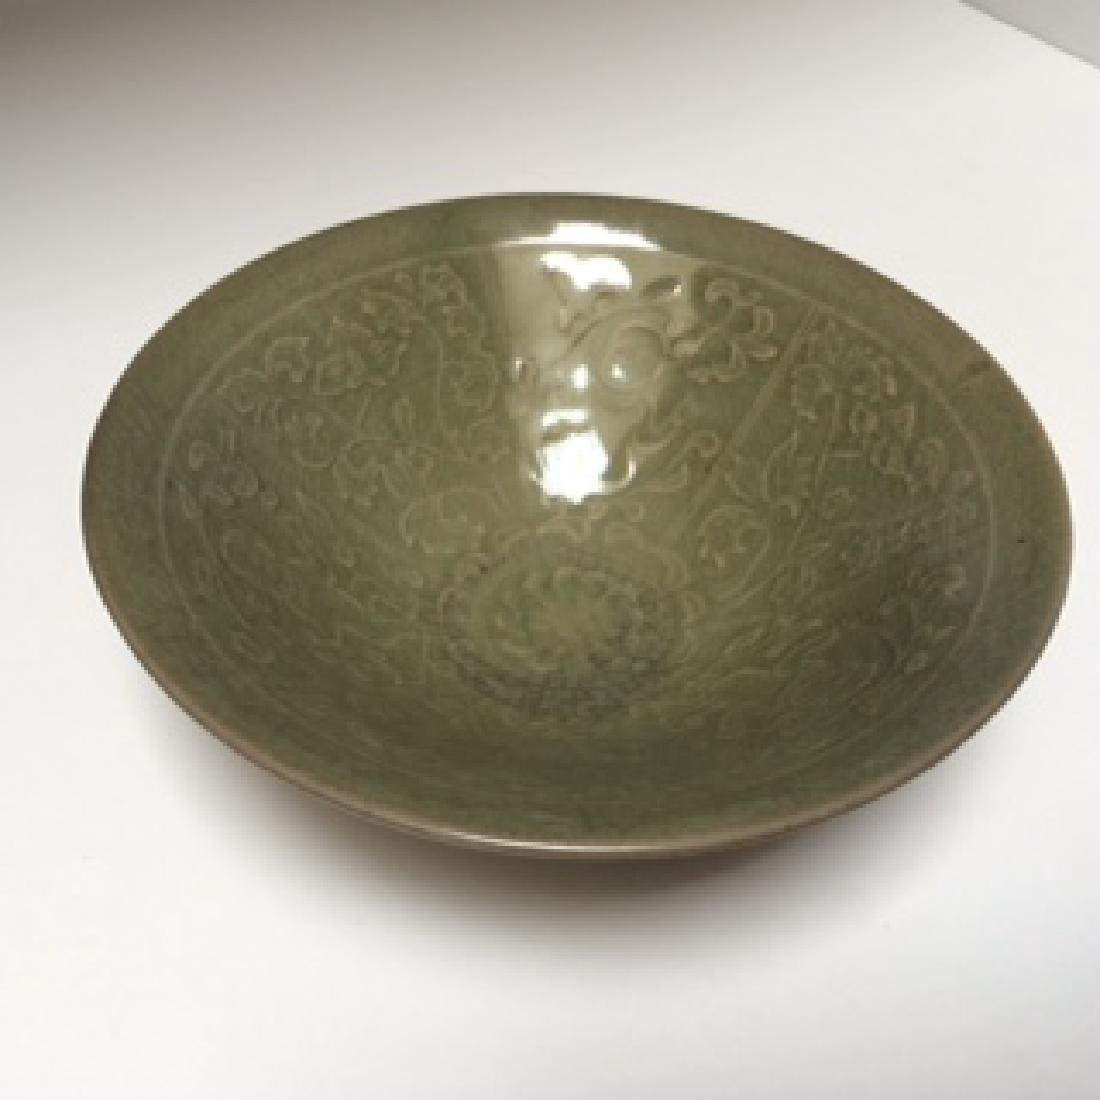 Yao Zhou Ware PorcelainGreen, 3 Boys Decorated Bowl